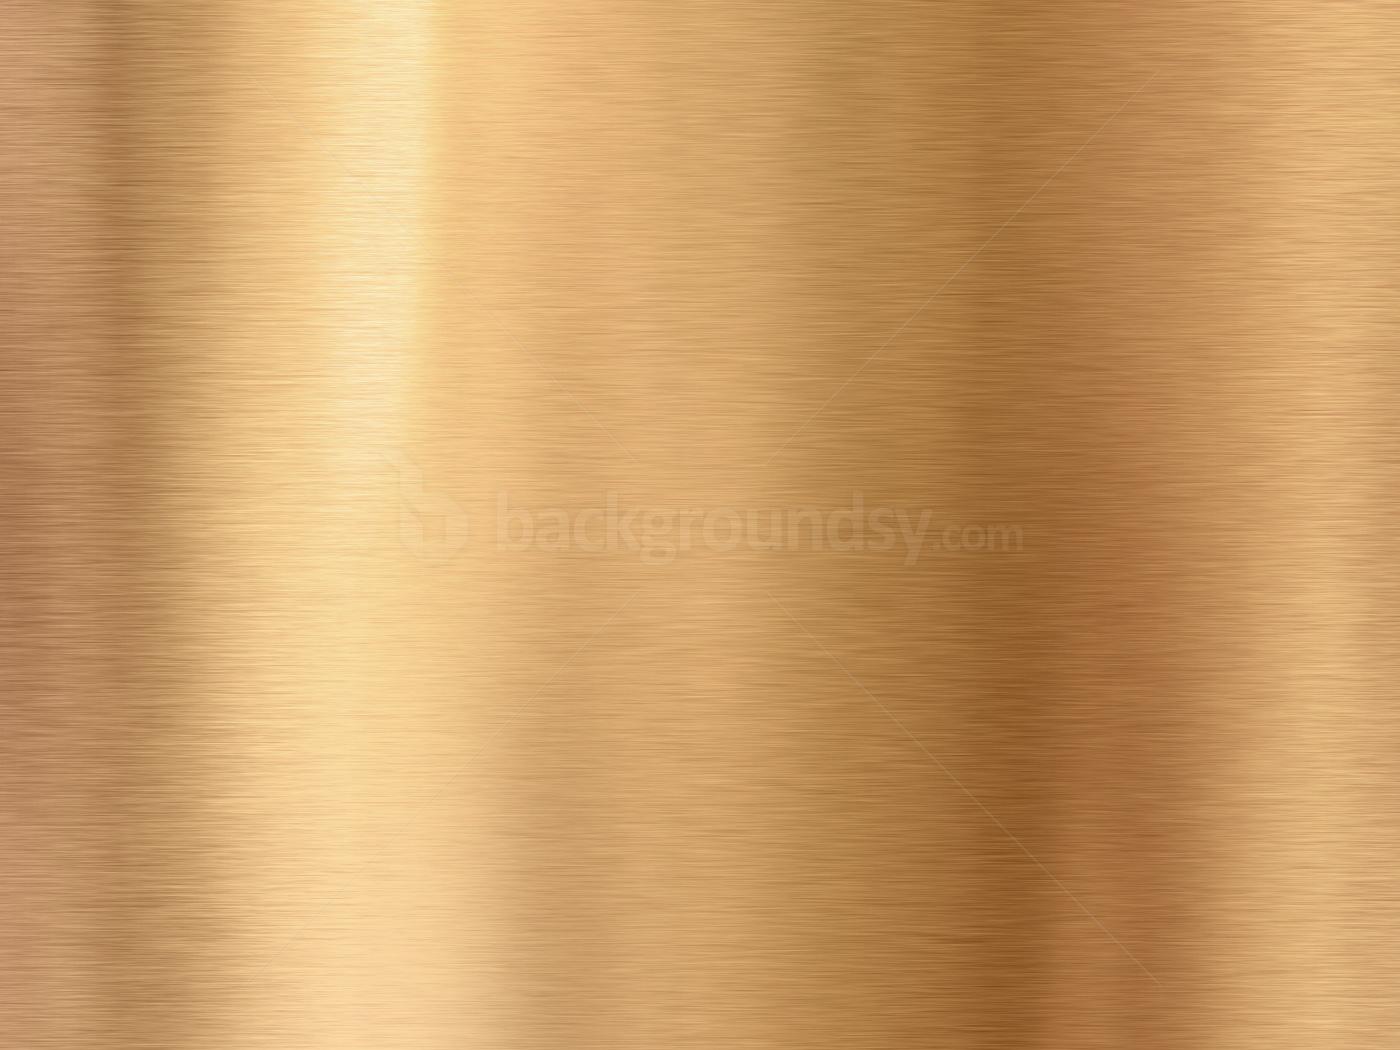 Bronze background Backgroundsycom 1400x1050